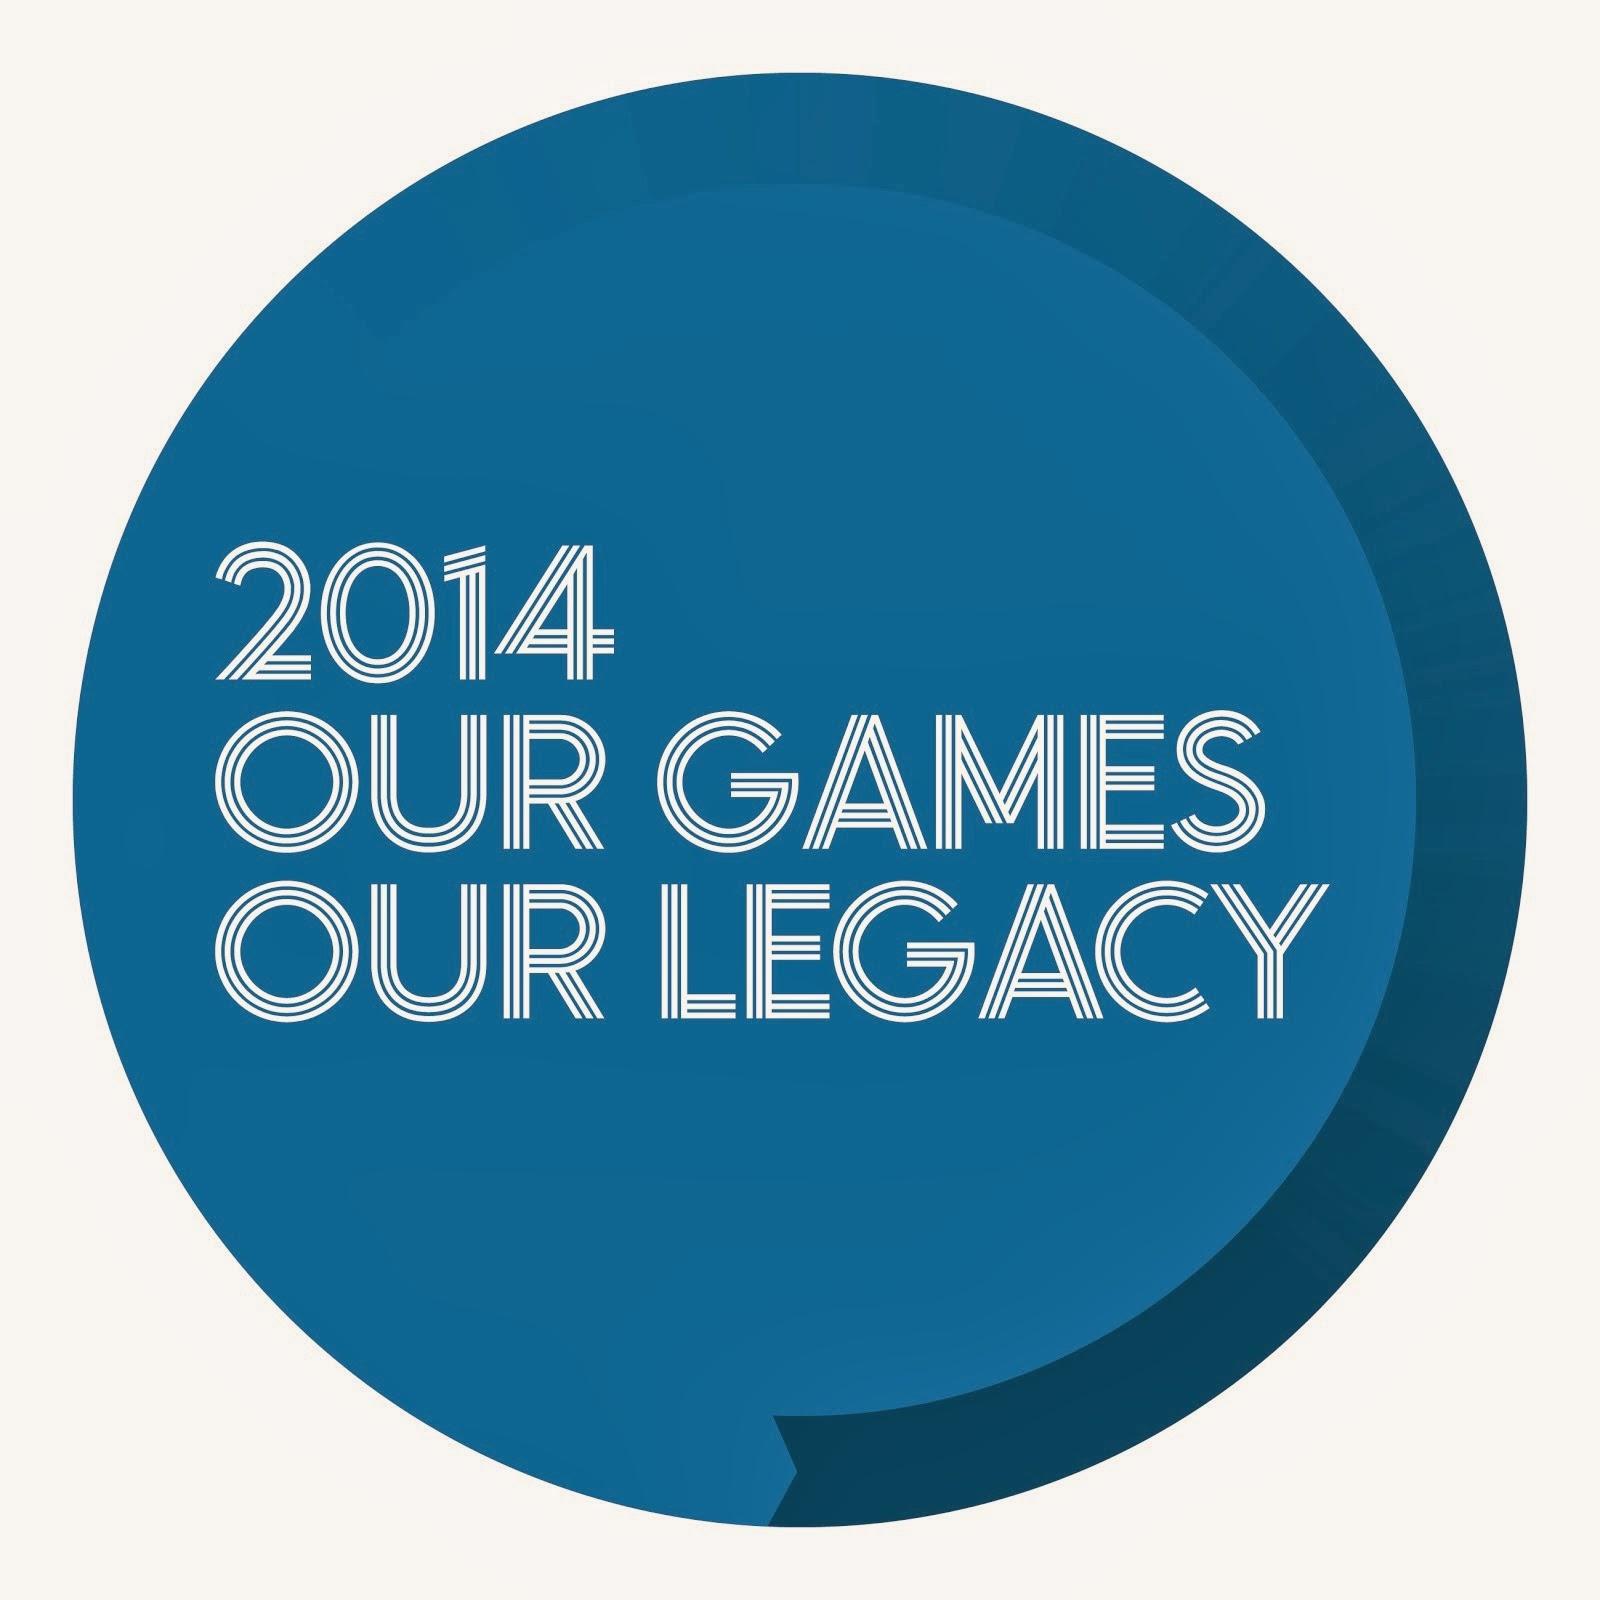 Celebrate 2014